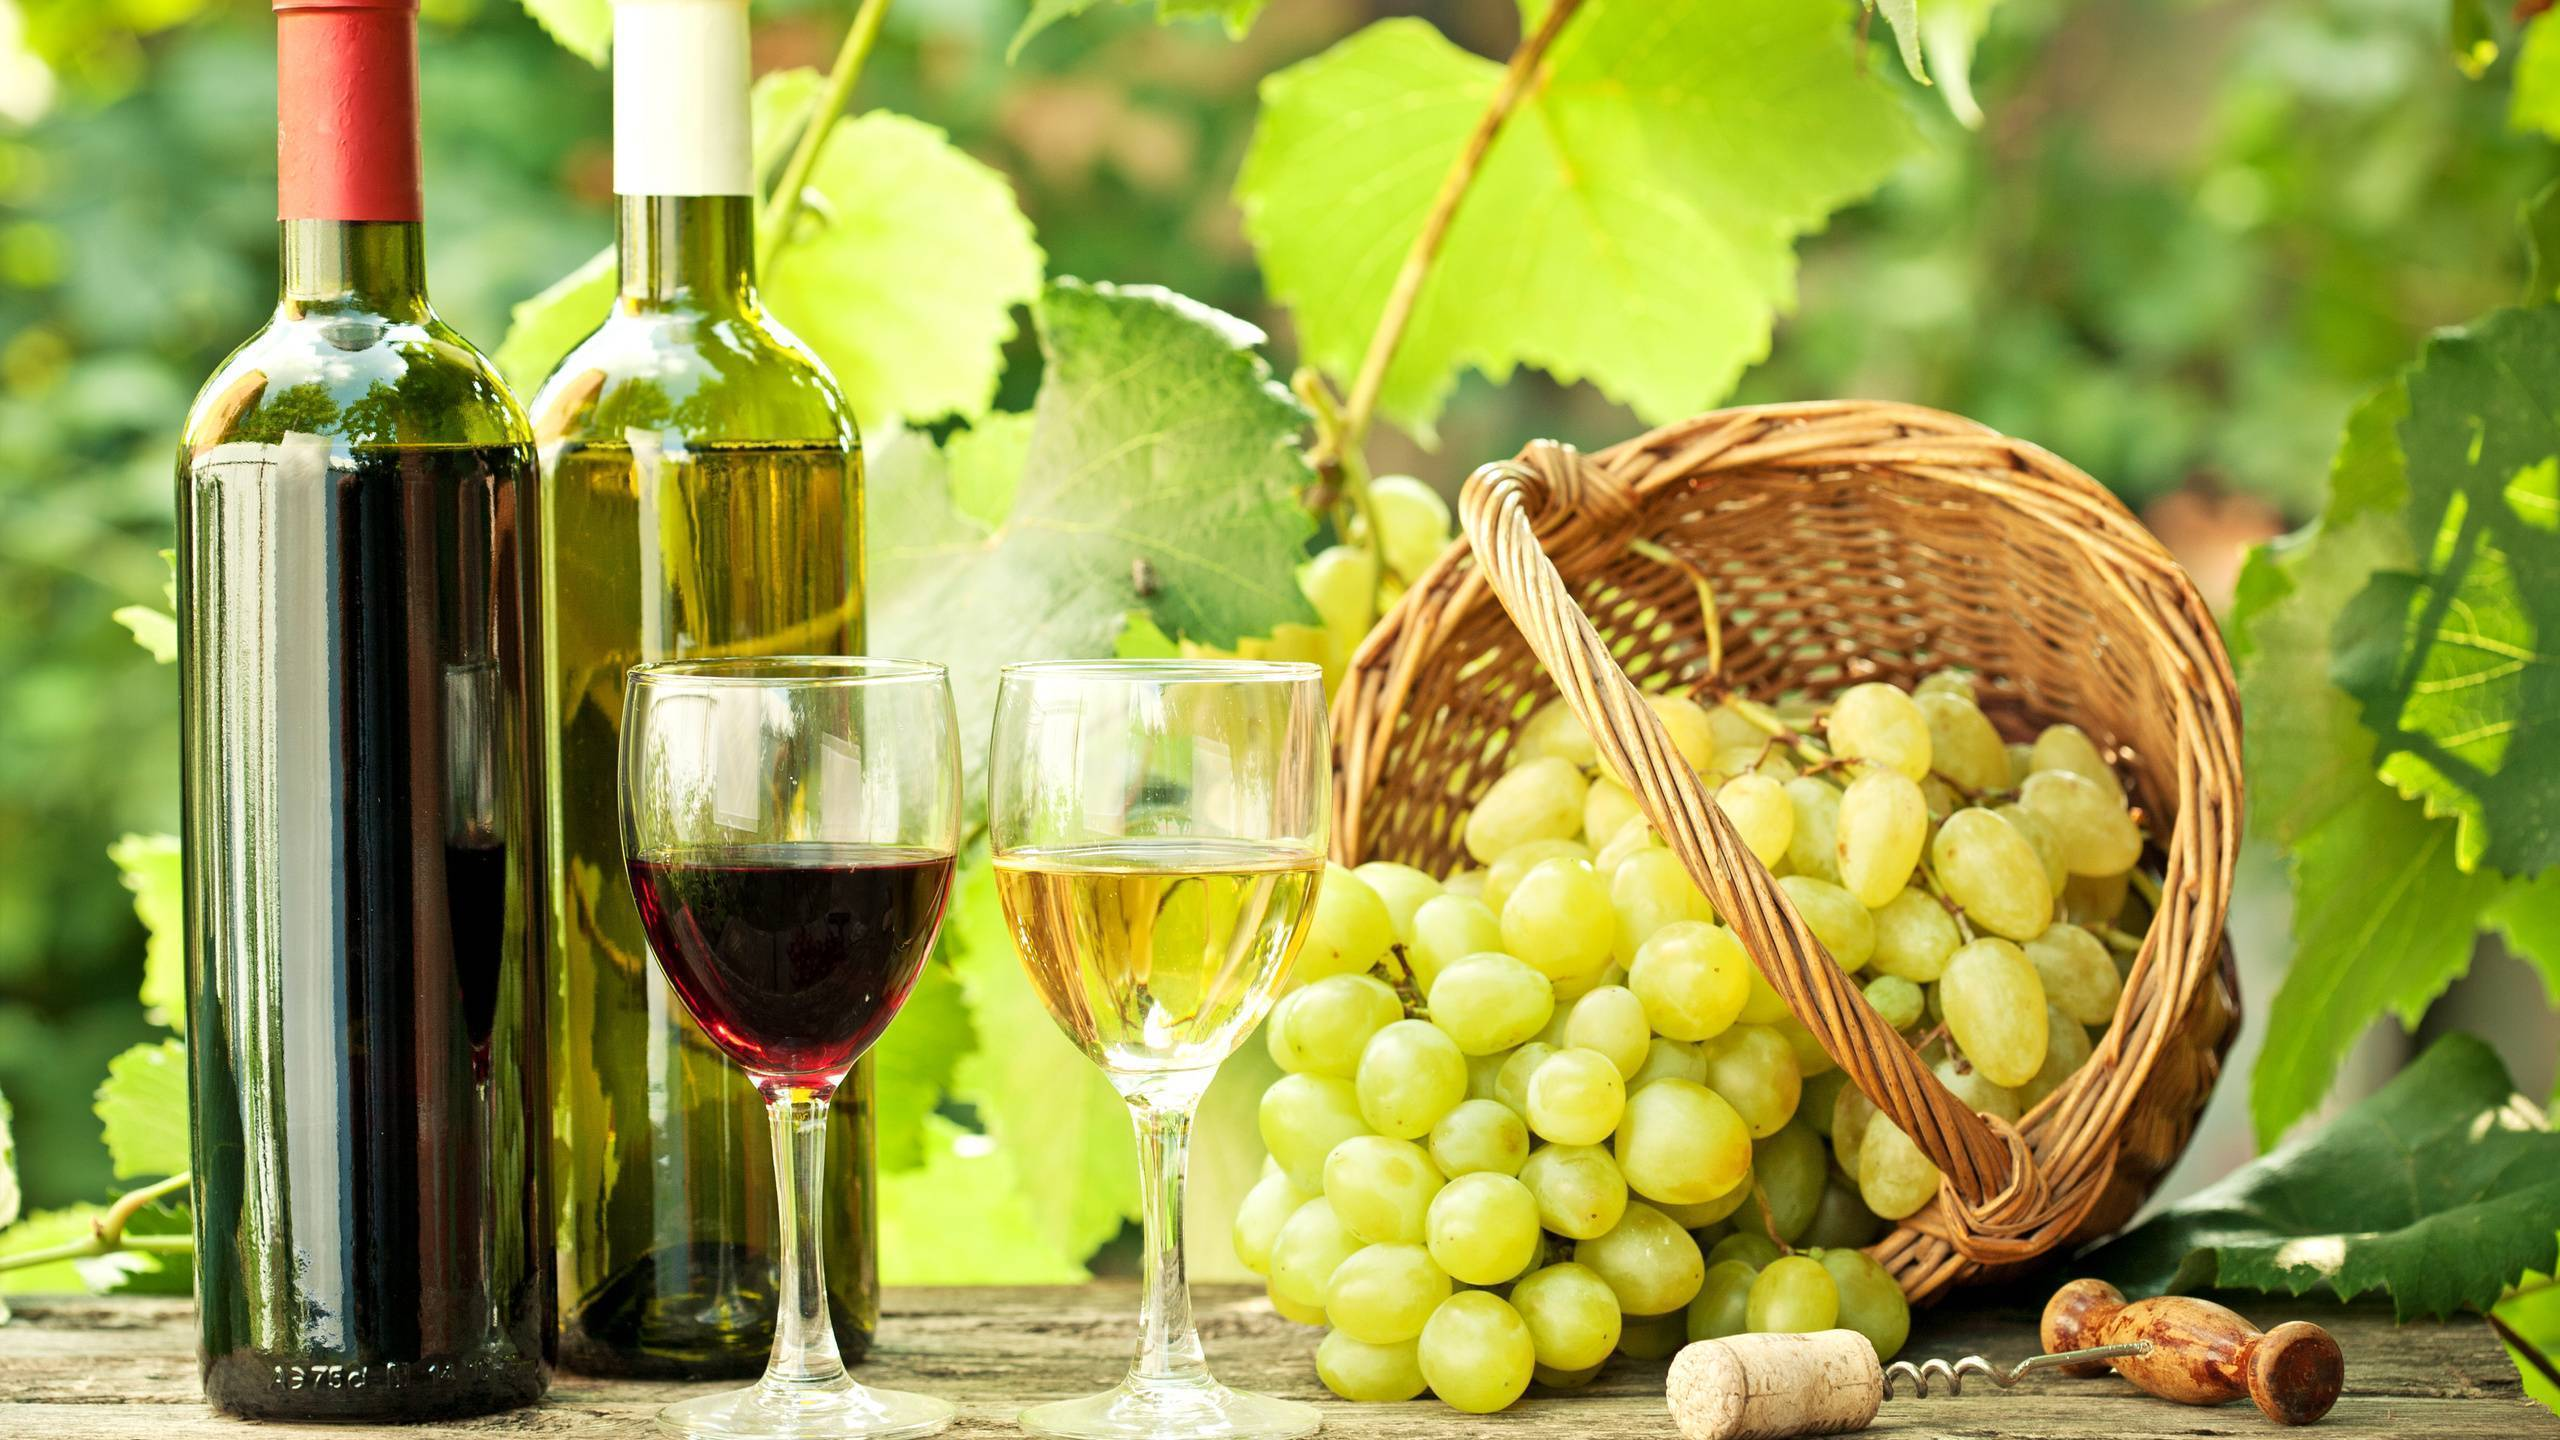 ✅ карбонизация вина в домашних условиях - питомник46.рф